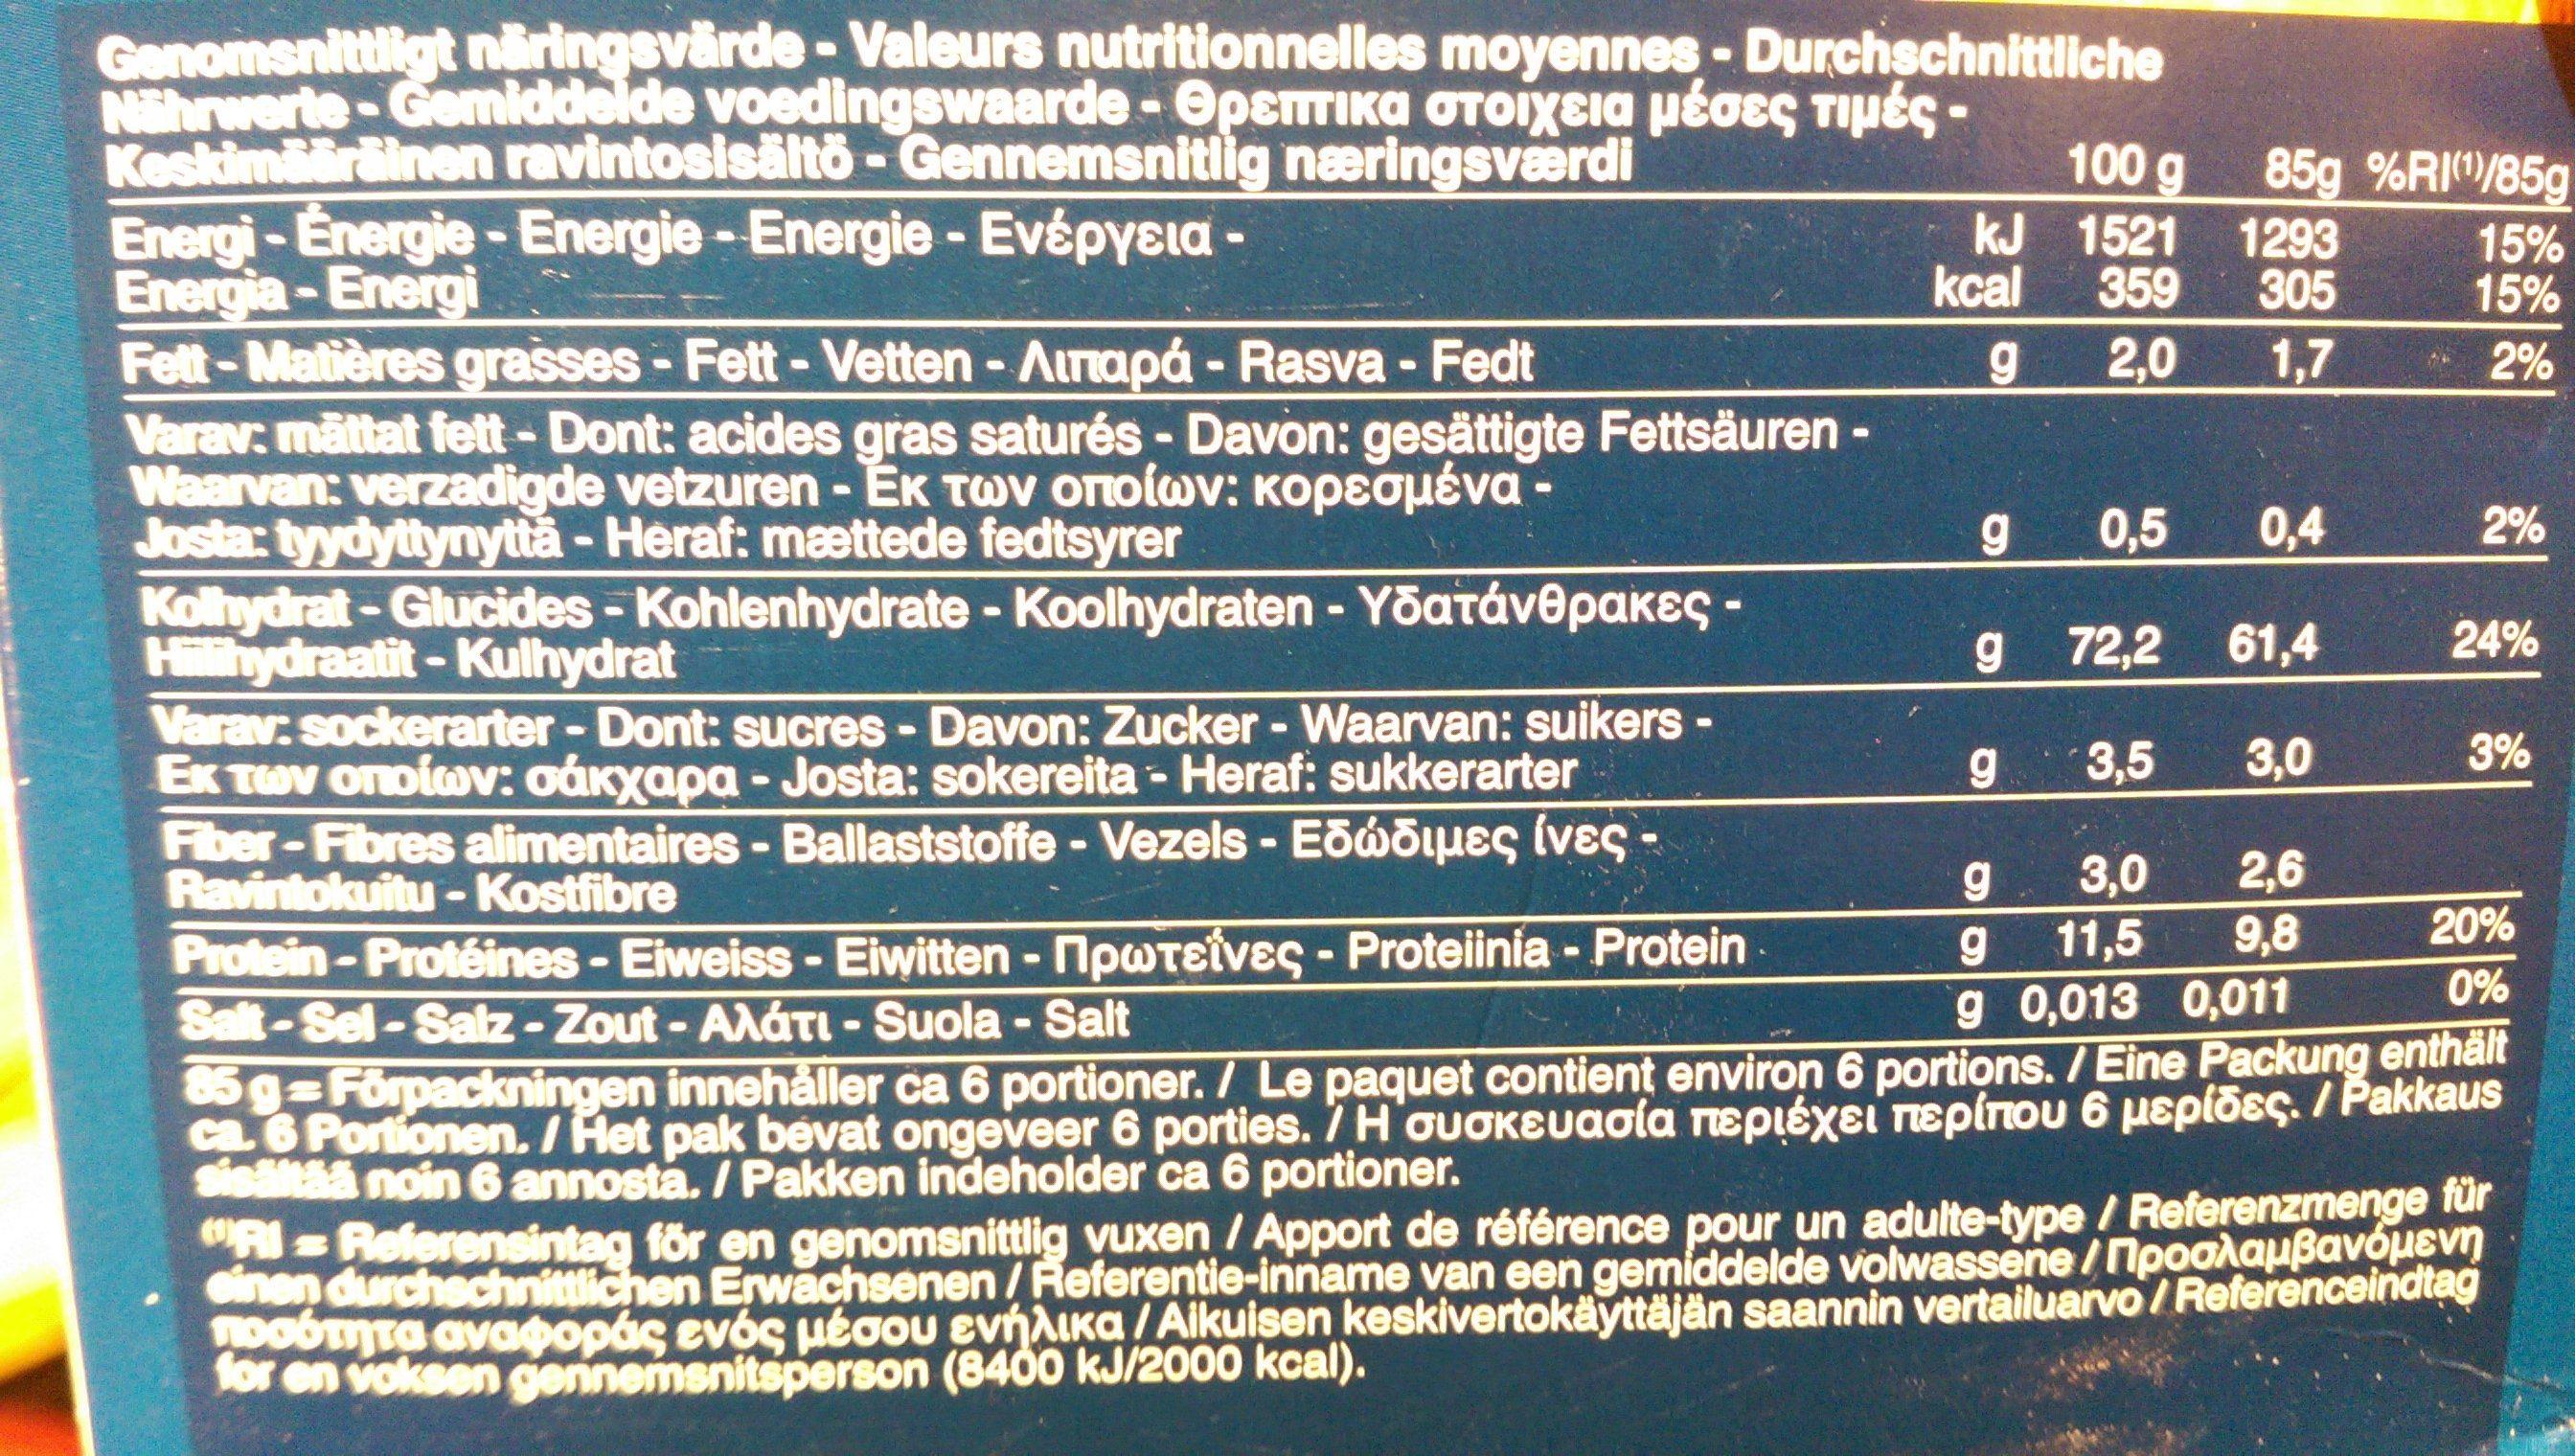 Barilla pates bio penne rigate - Nutrition facts - fr